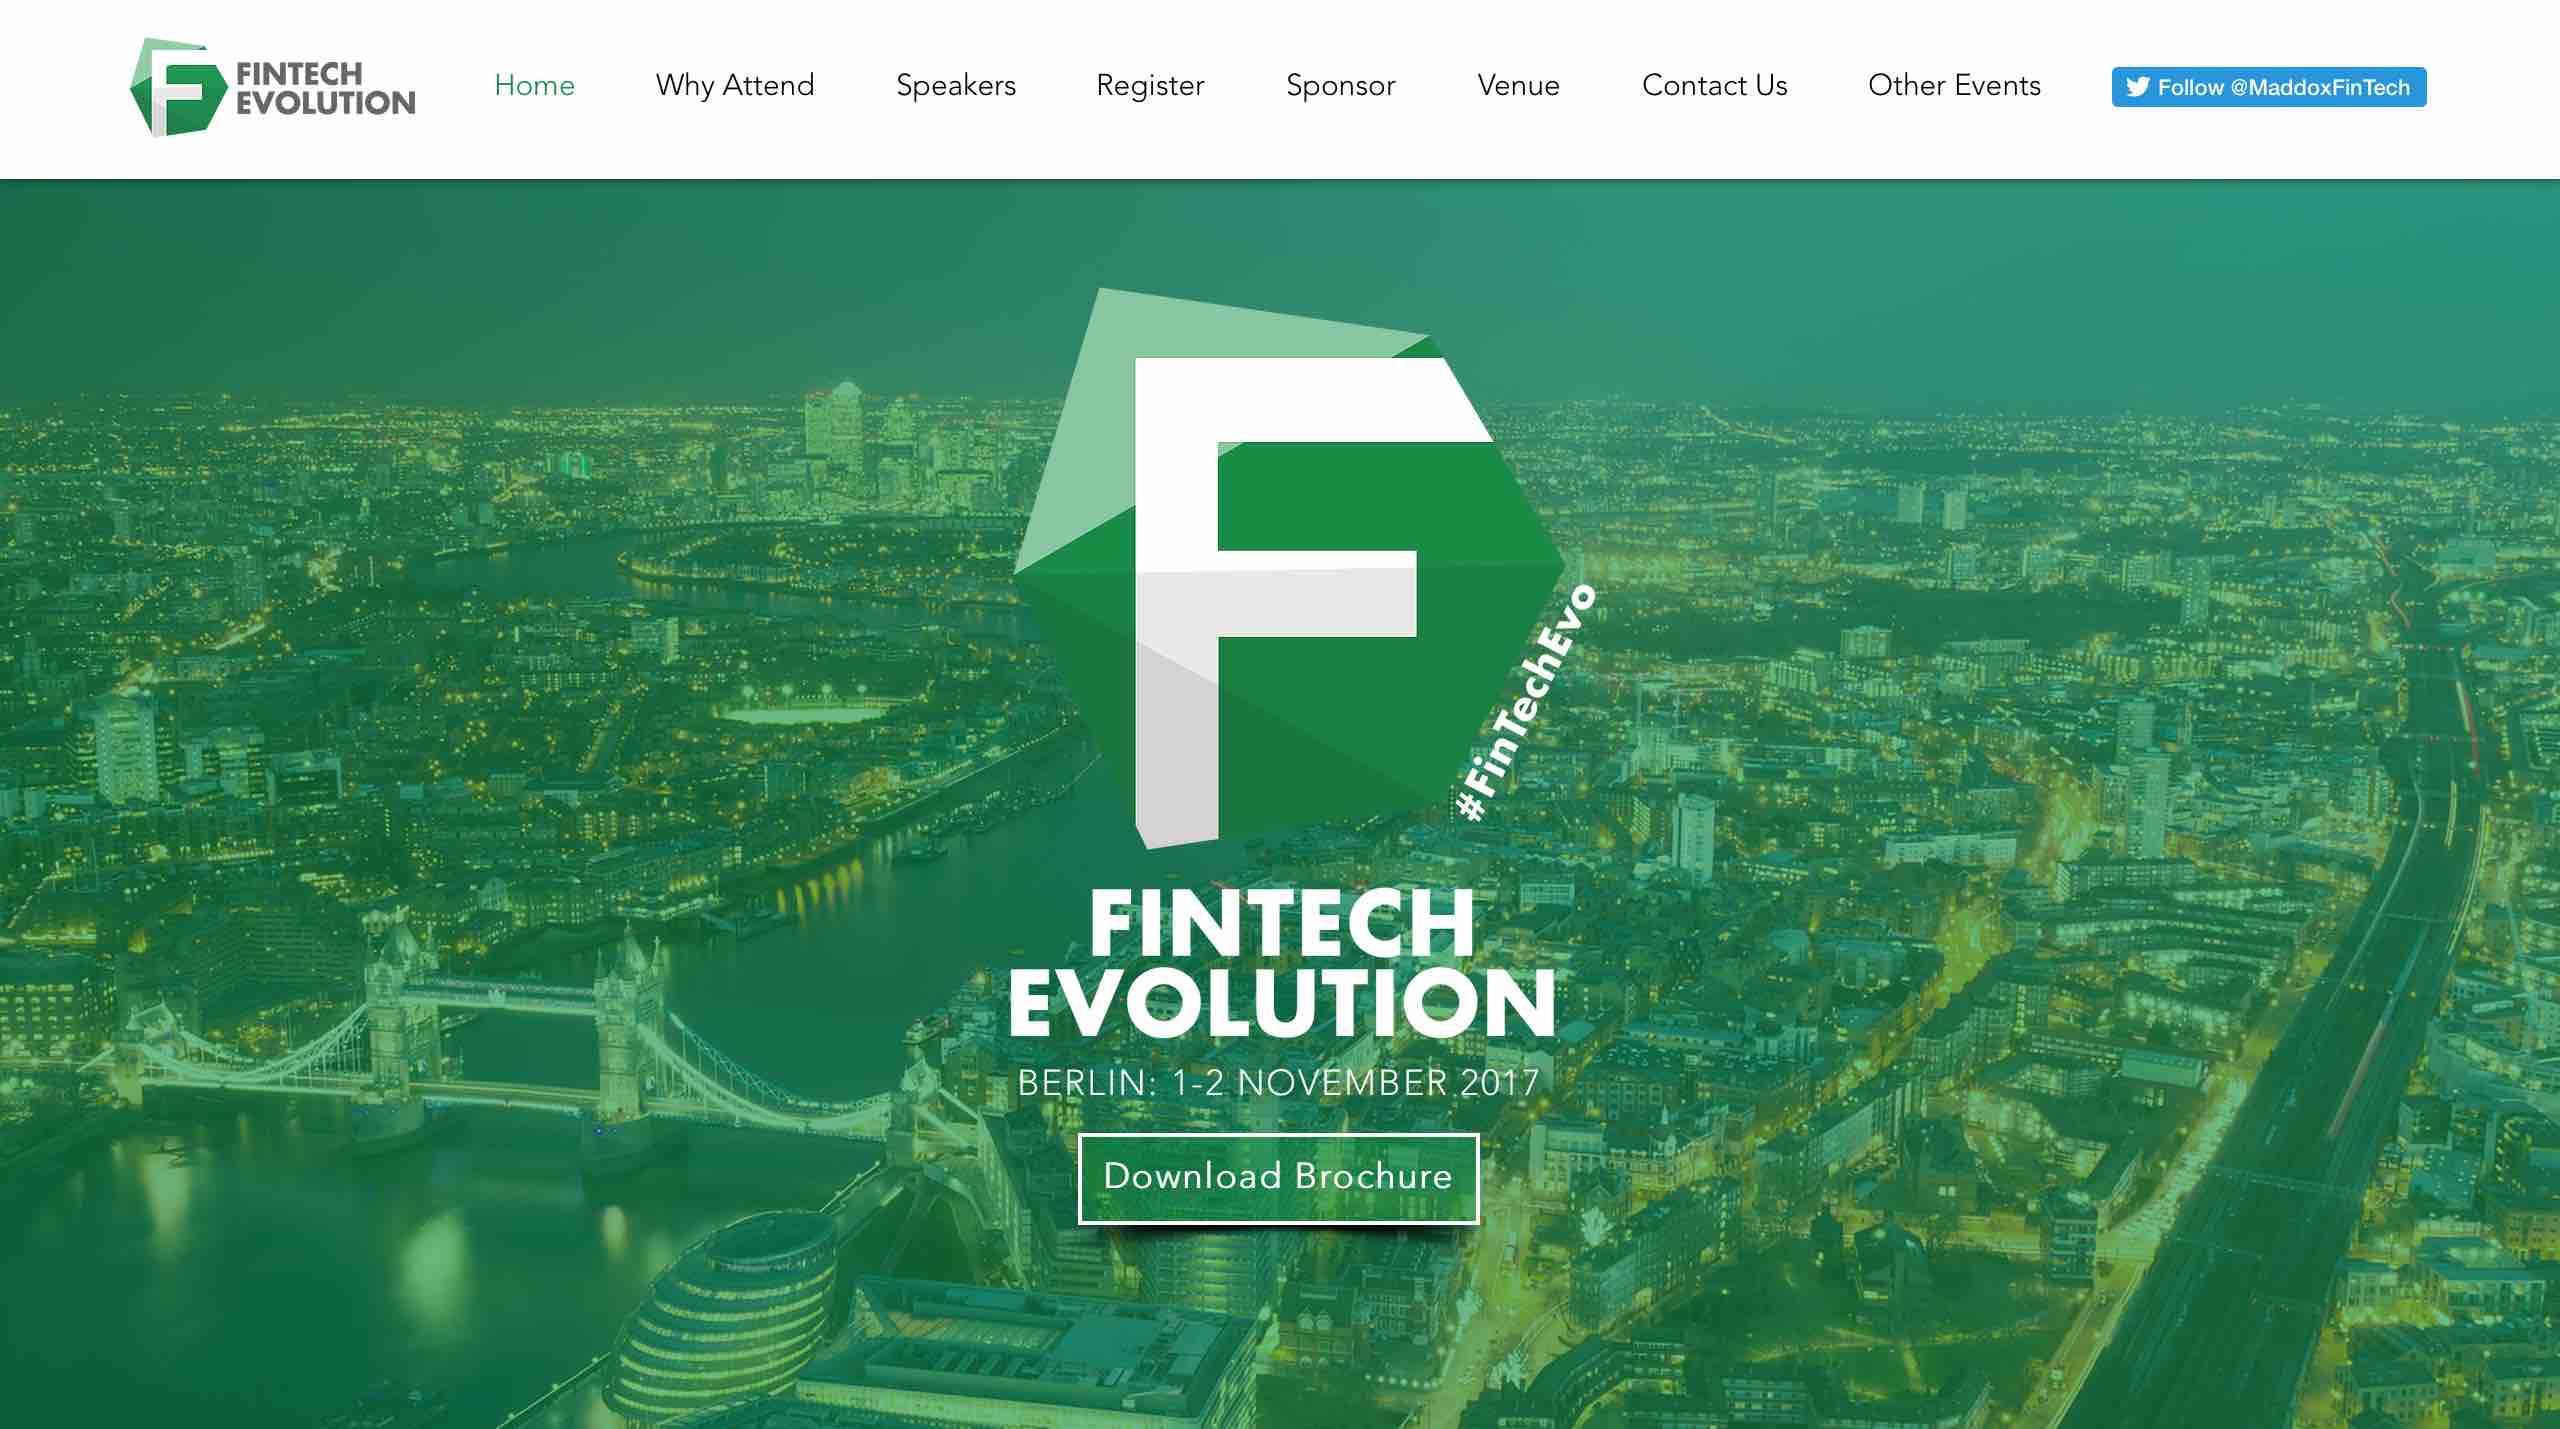 fintech evolution conference